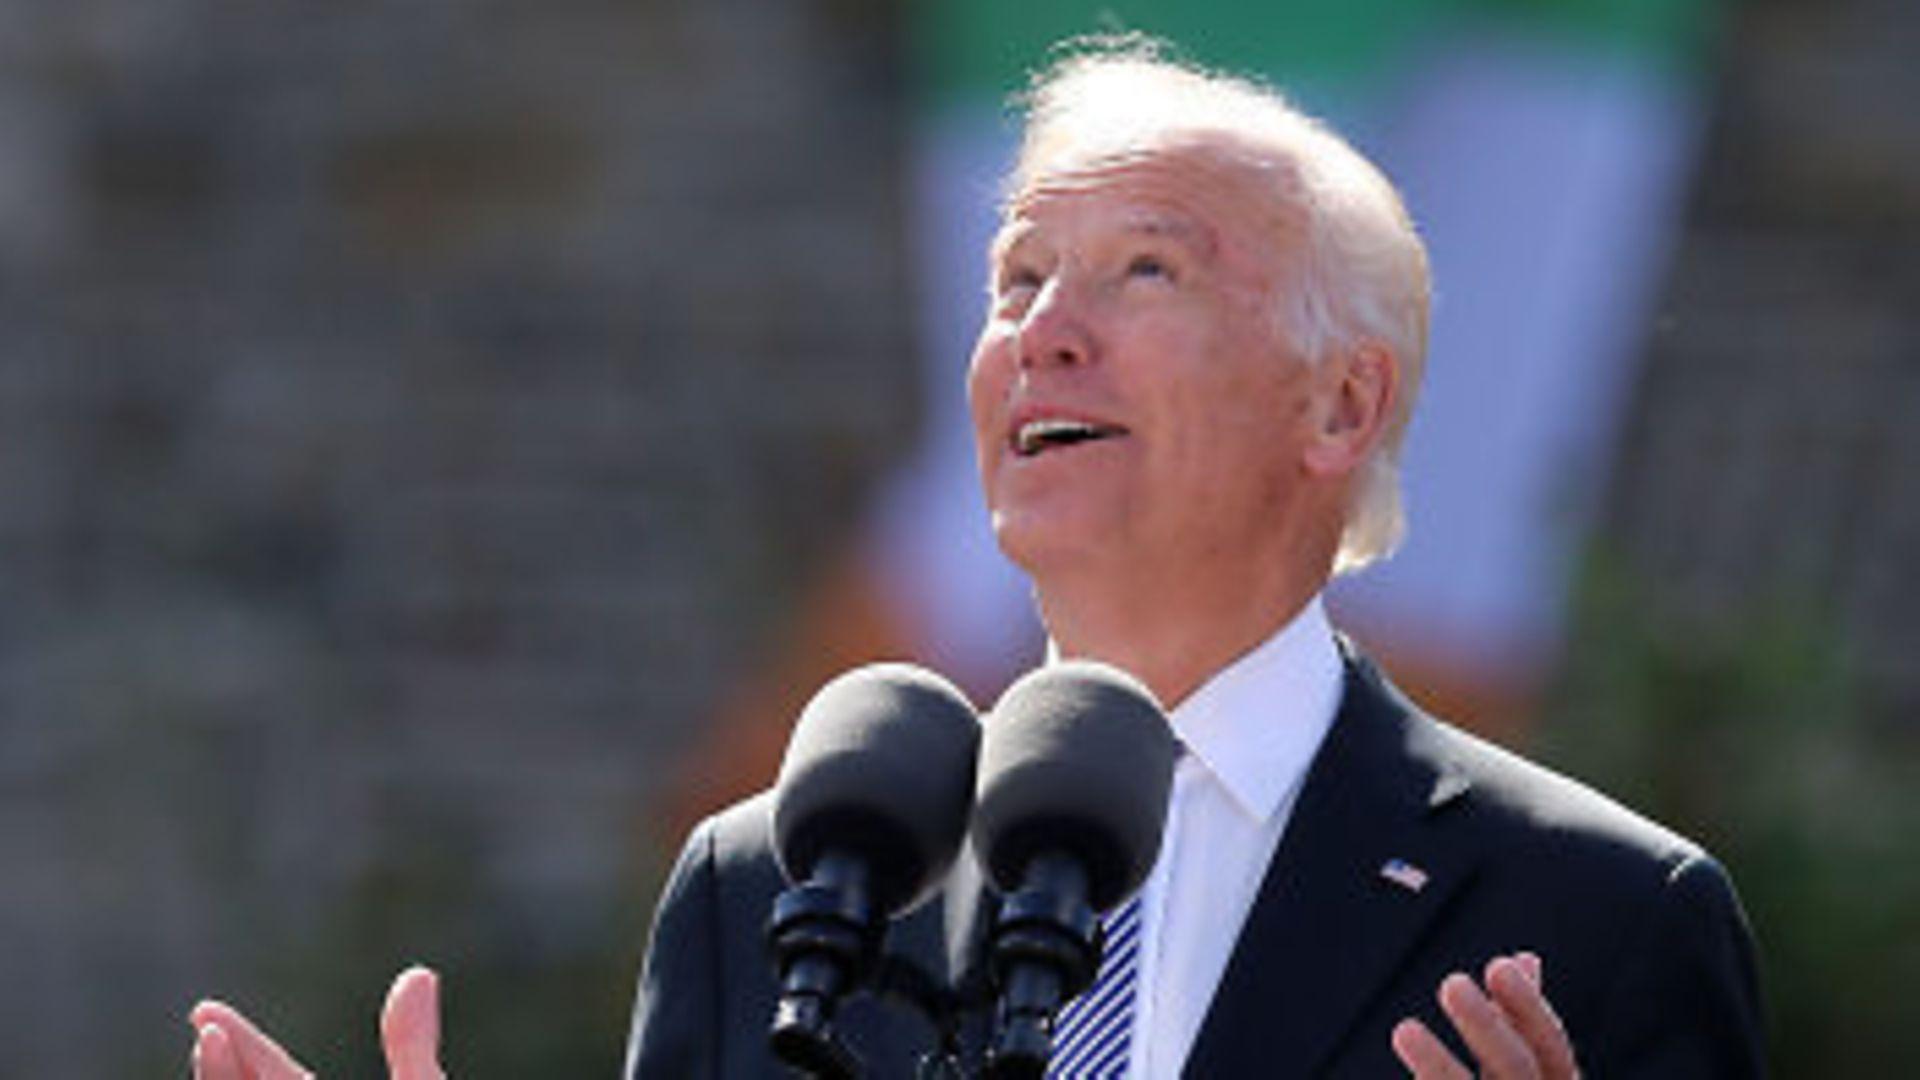 Joe Biden delivers a speech - Credit: PA